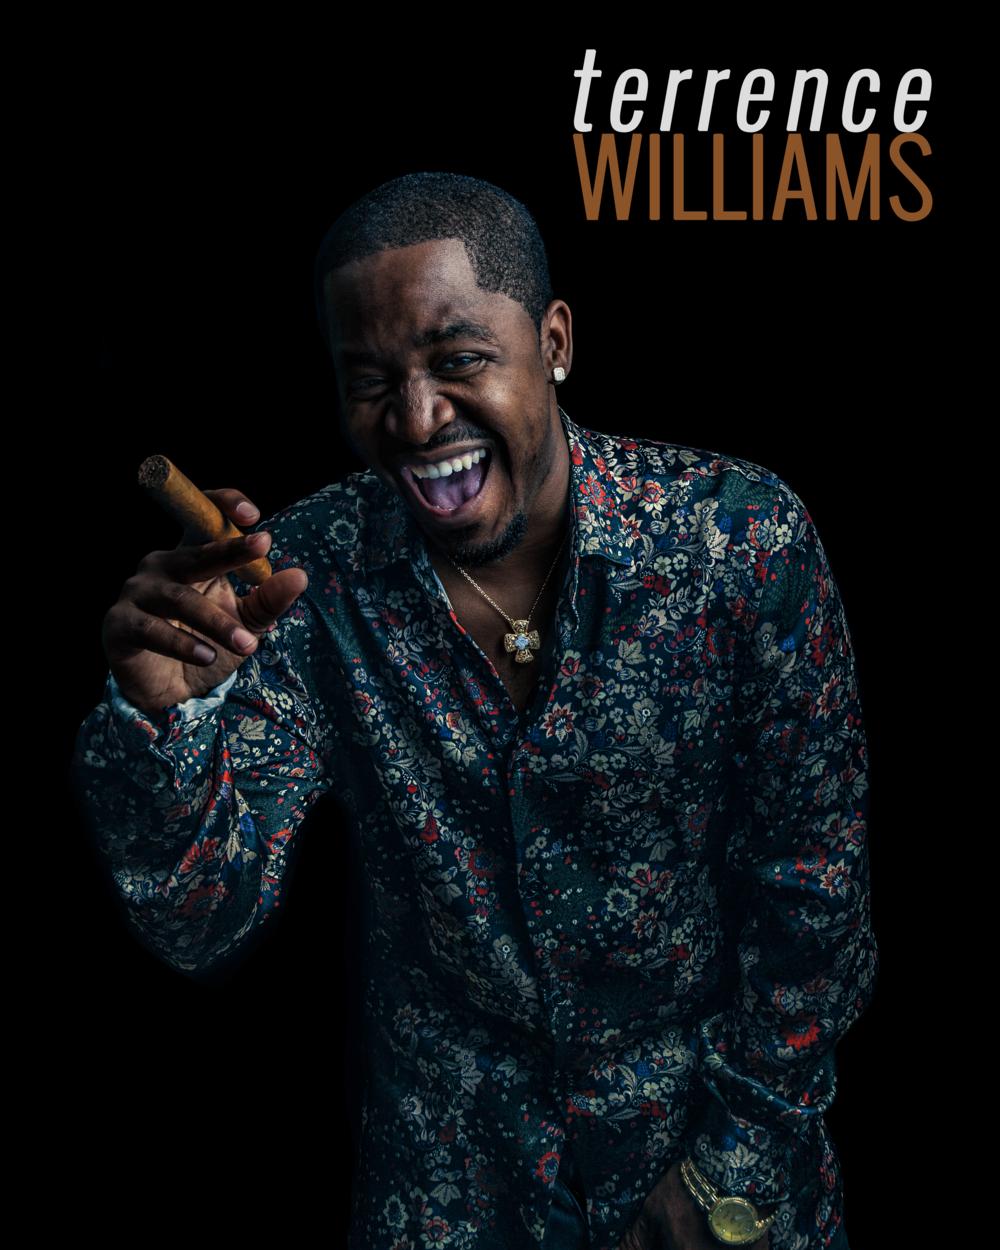 Terrence Williams